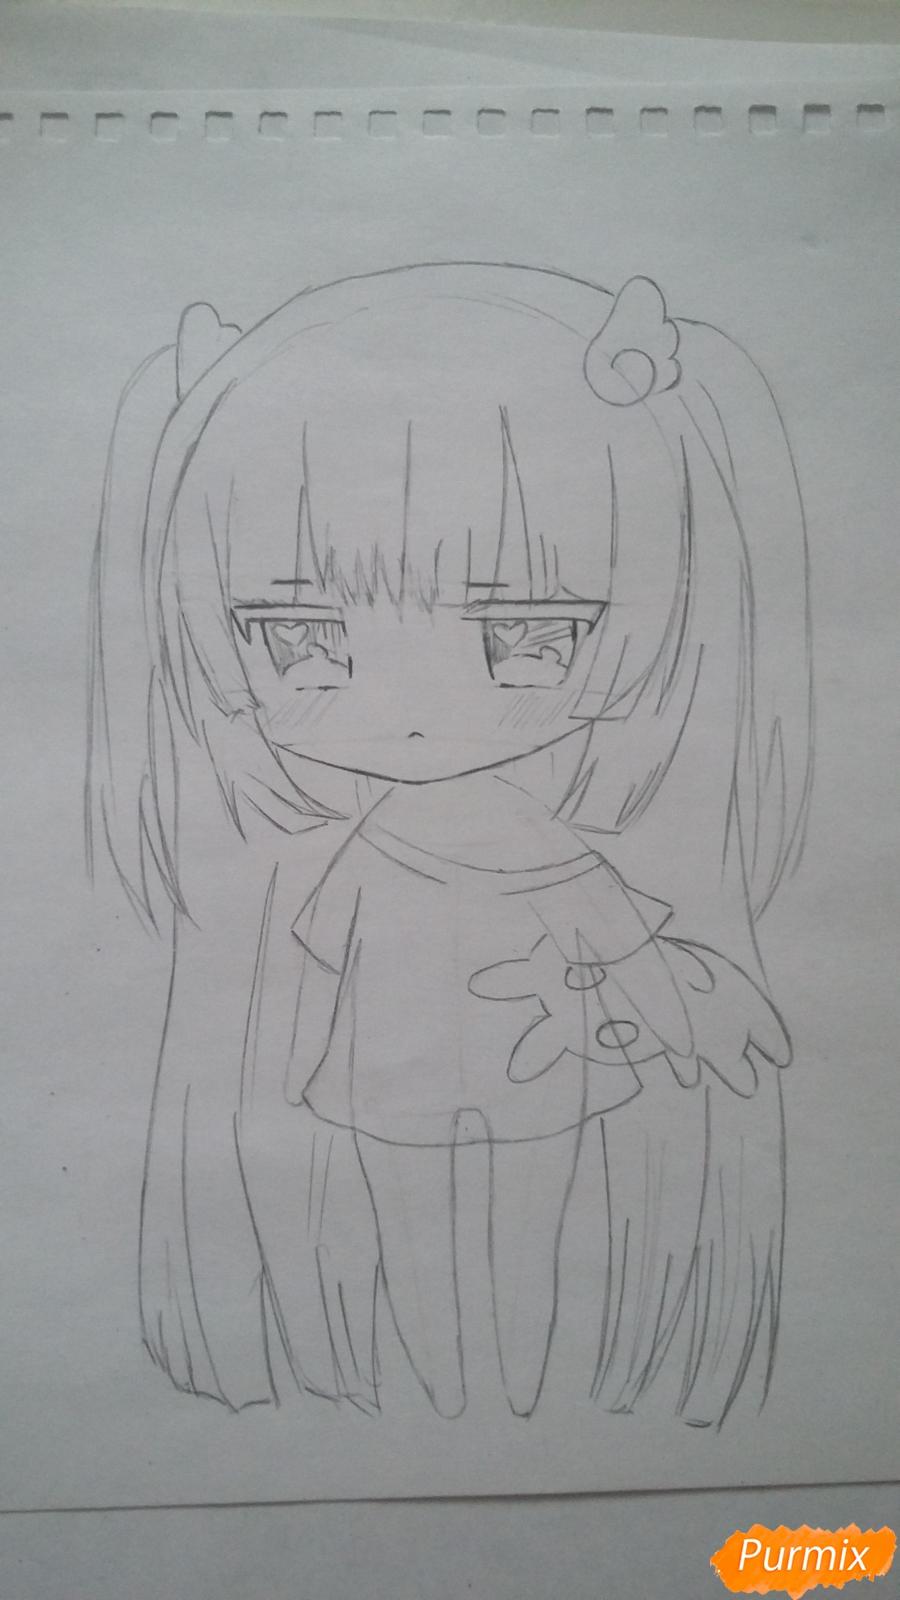 Рисуем милую чиби-тян в пижаме и игрушкой в руке карандашами - шаг 7